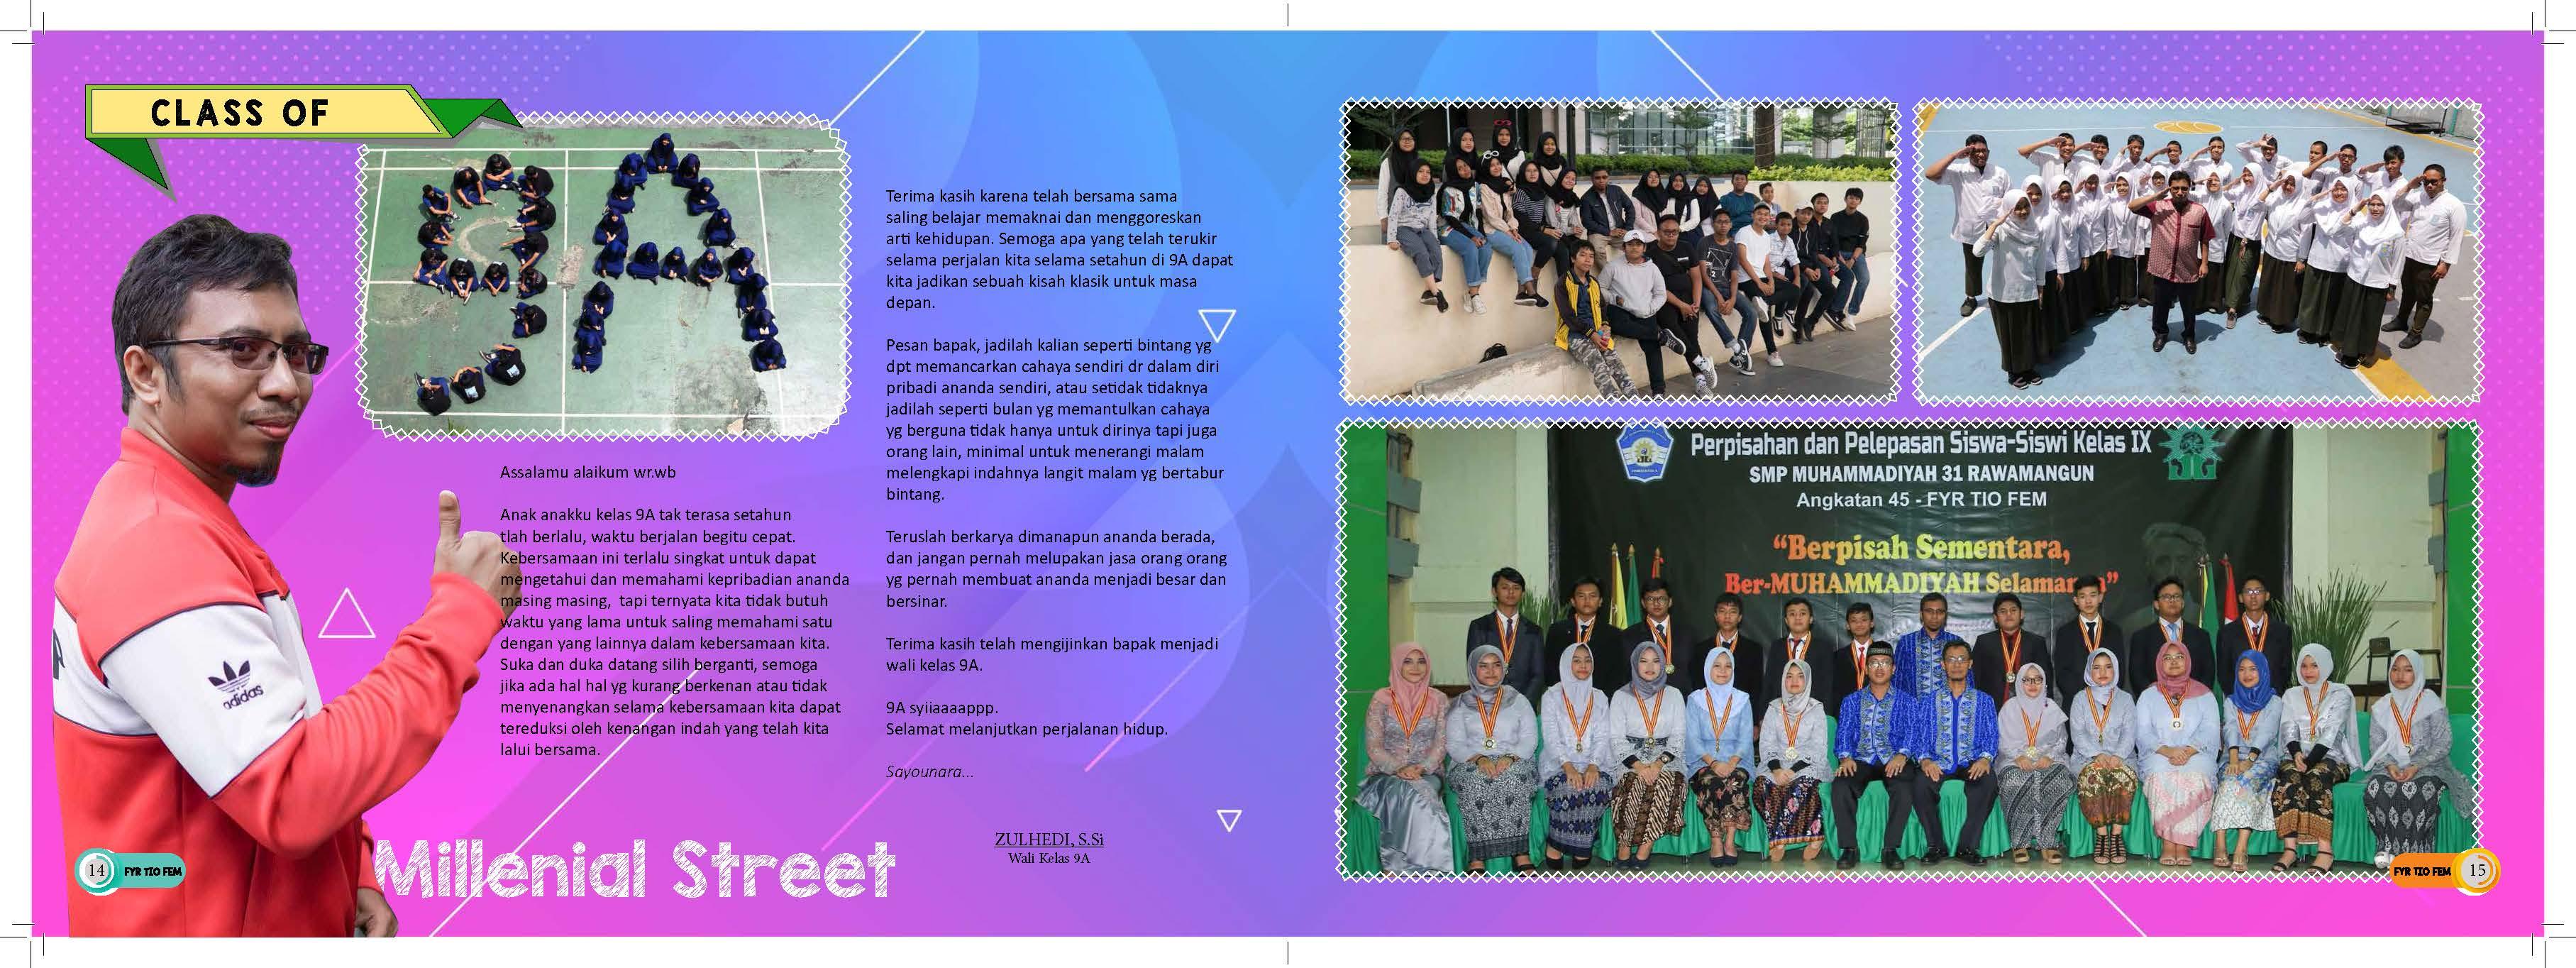 SMP 31 tahun 2019_Page_09